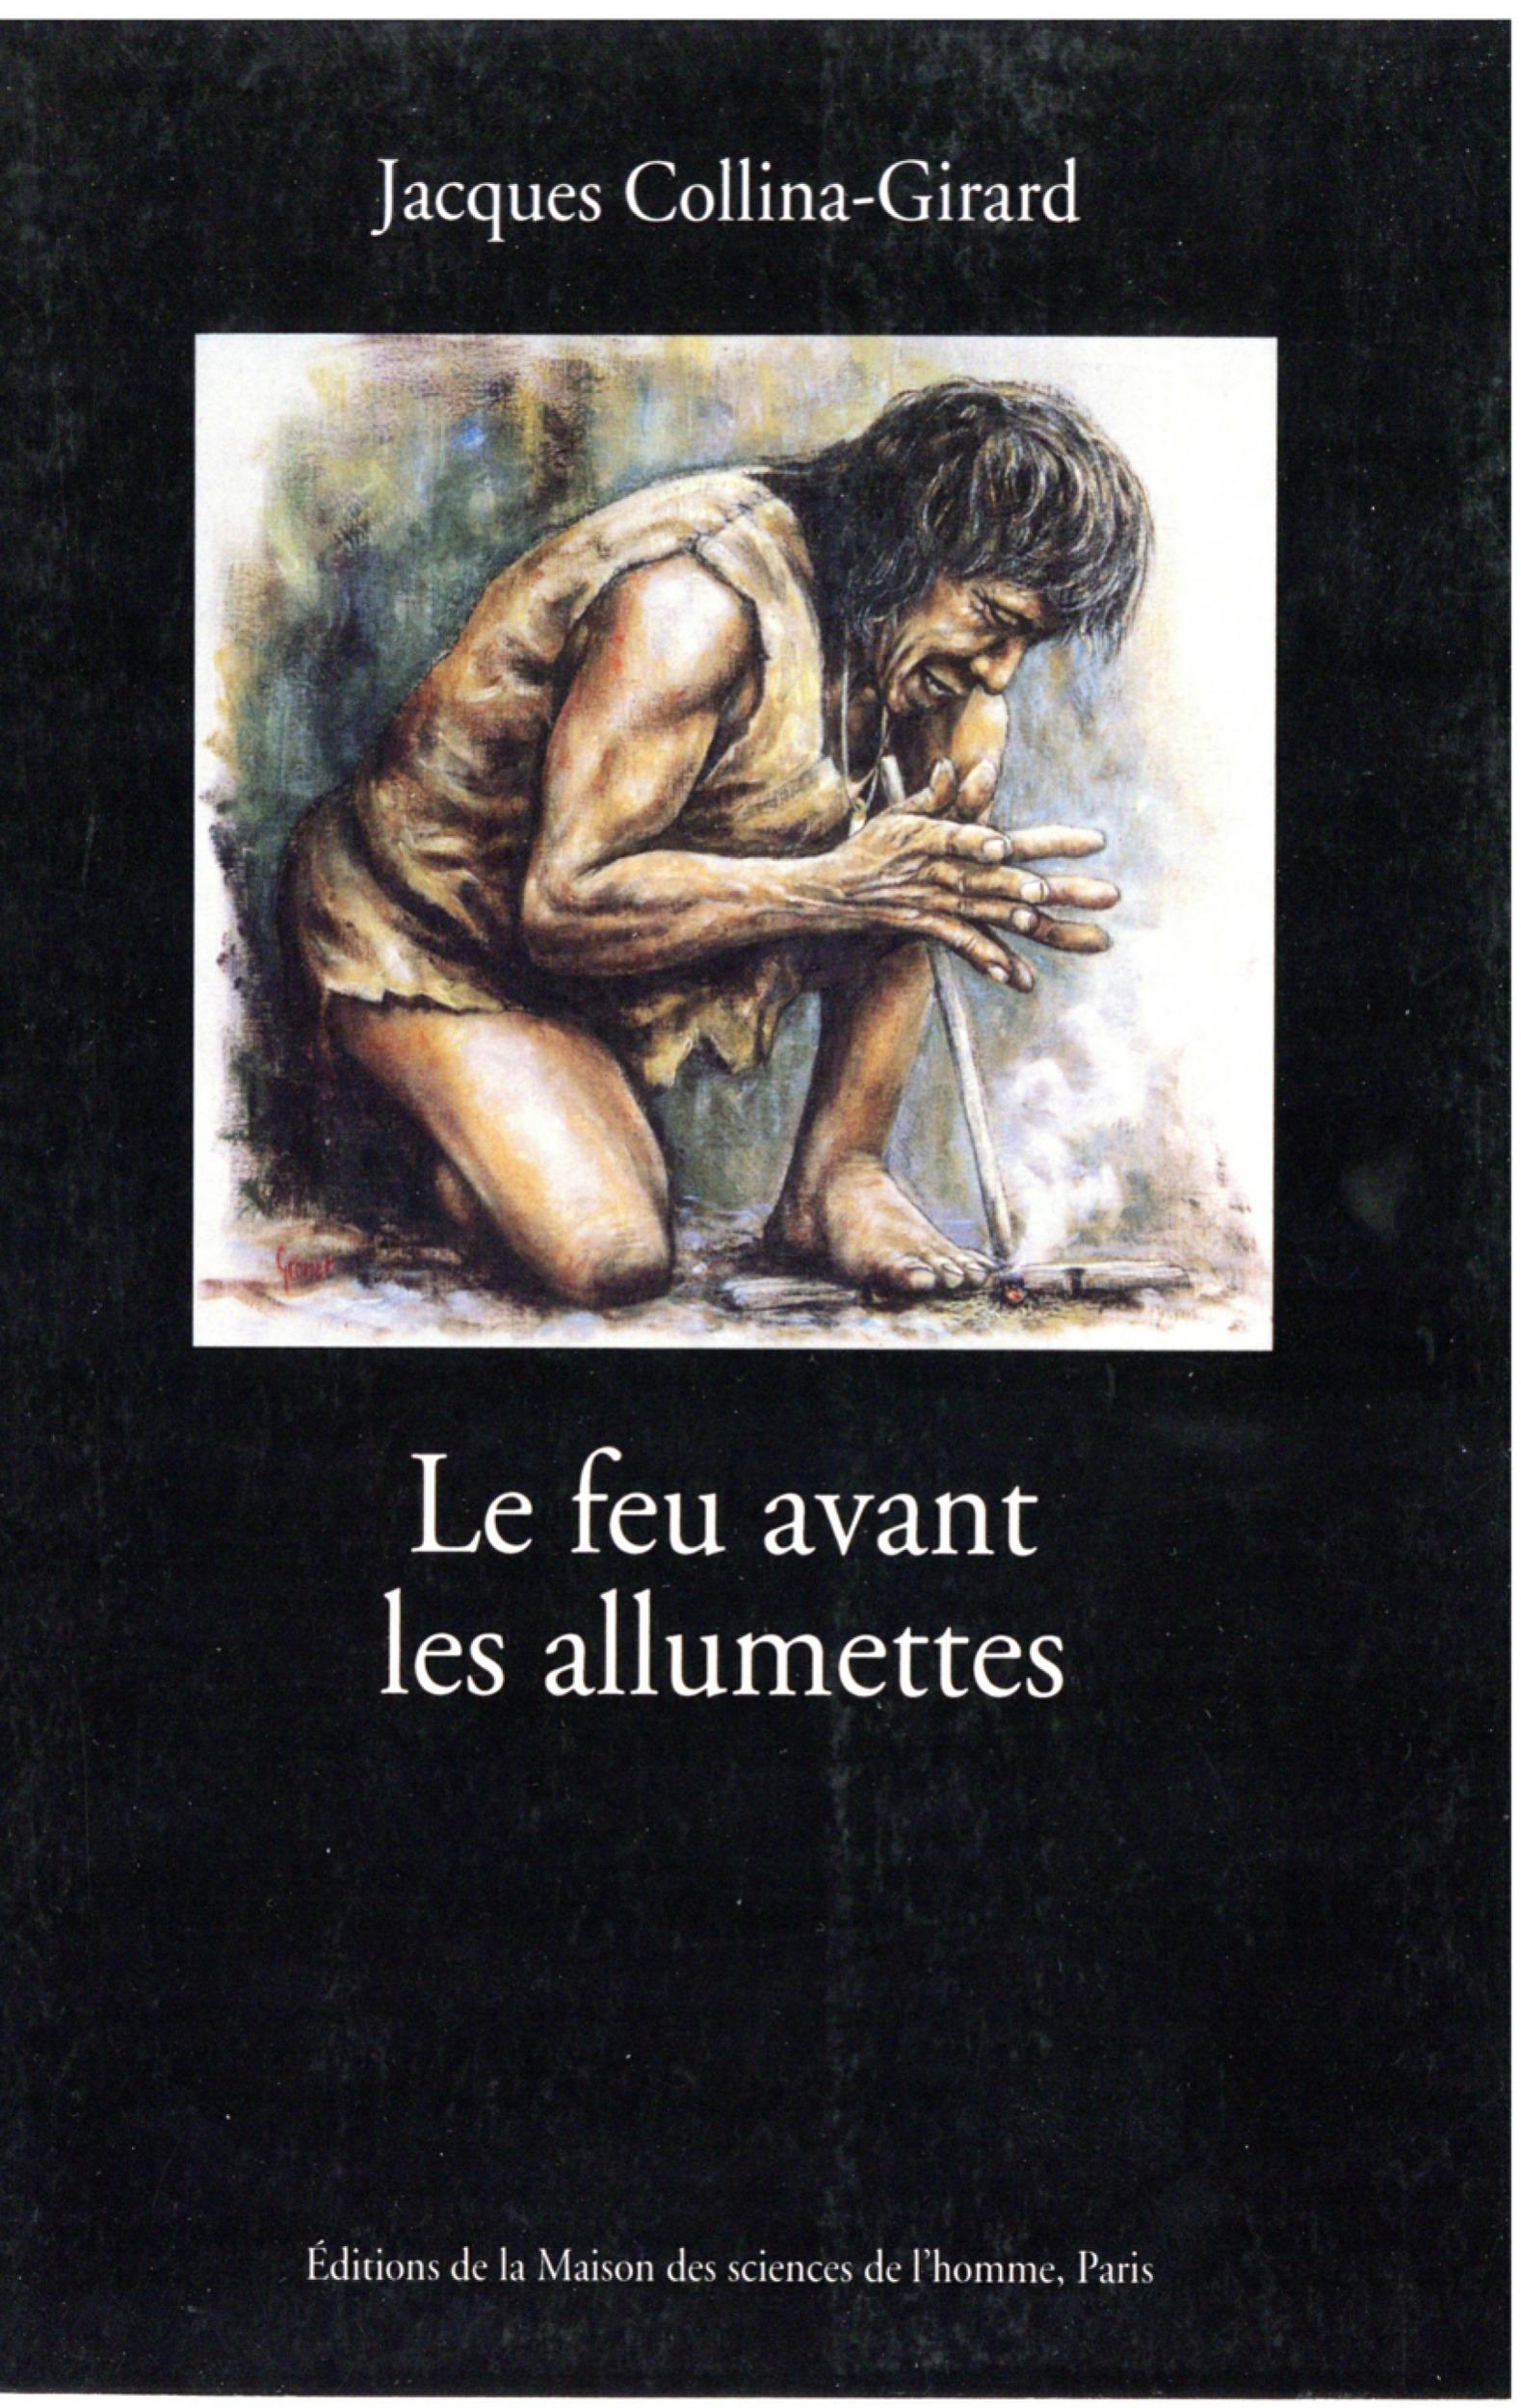 Jacques Collina-Girard Le feu avant les allumettes